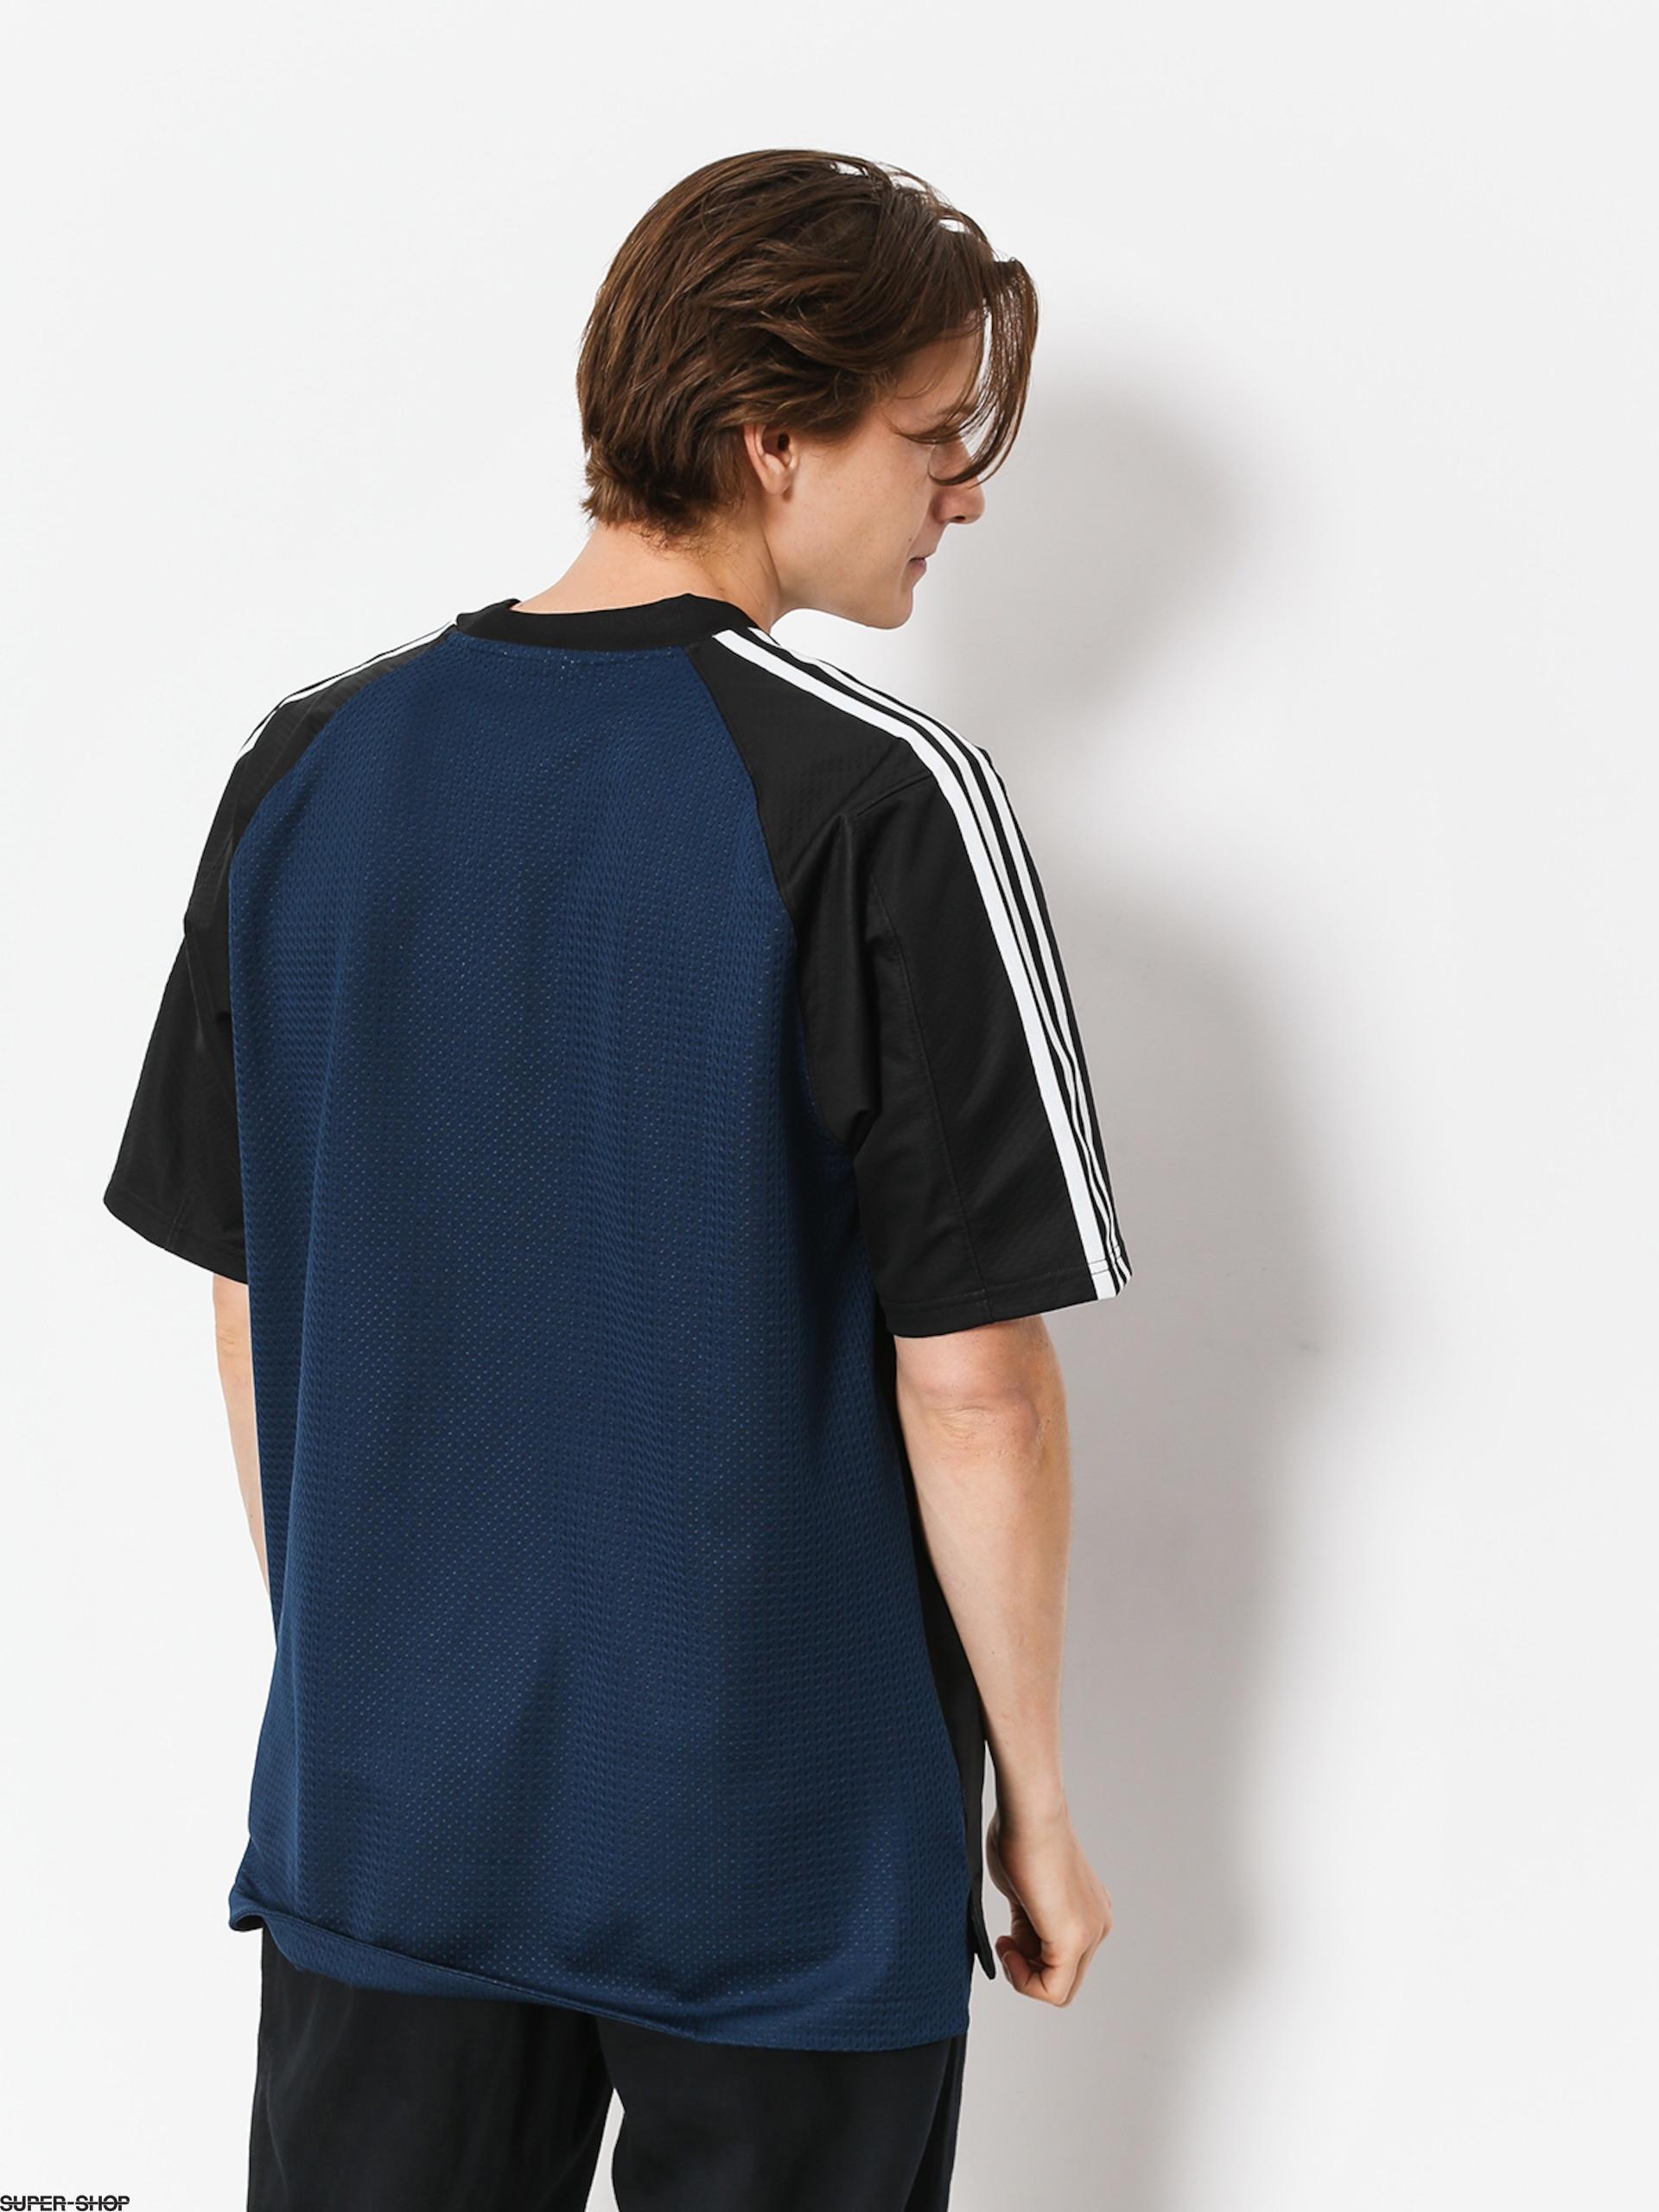 adidas Originals 2020 Jersey T-shirt (black/conavy)